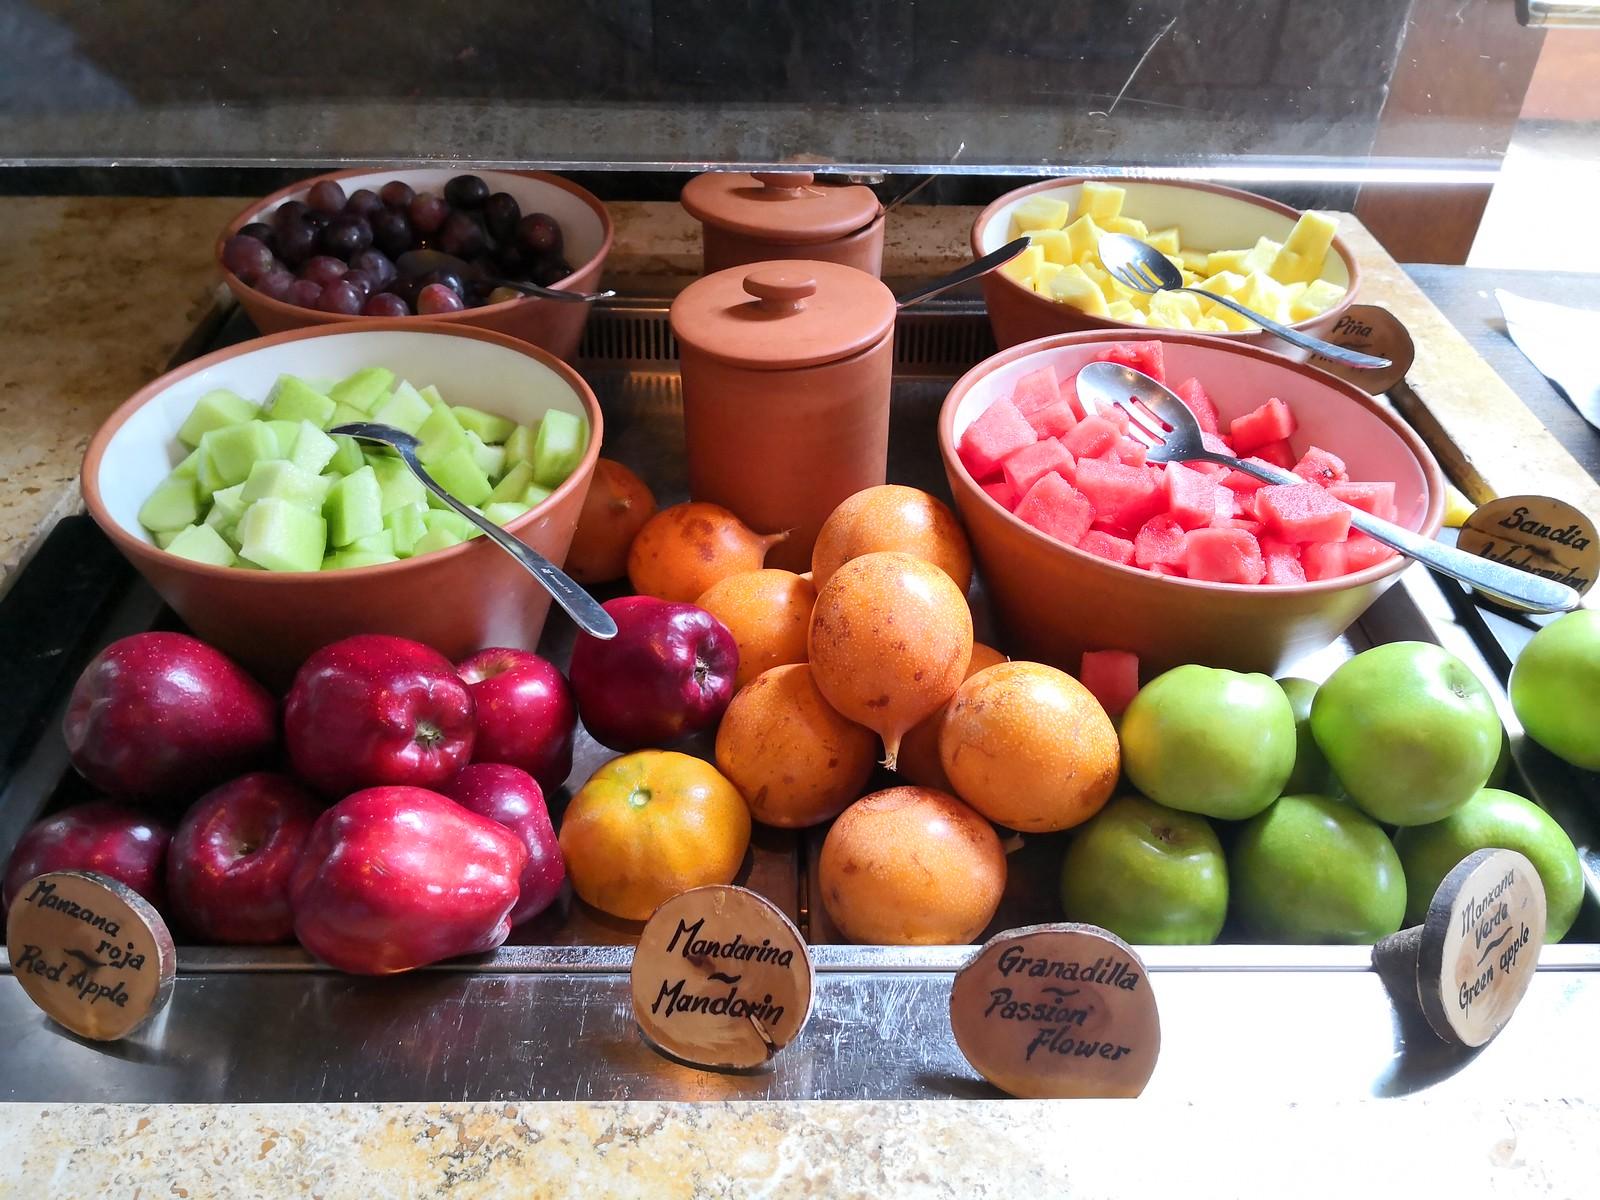 Fresh and cut fruits